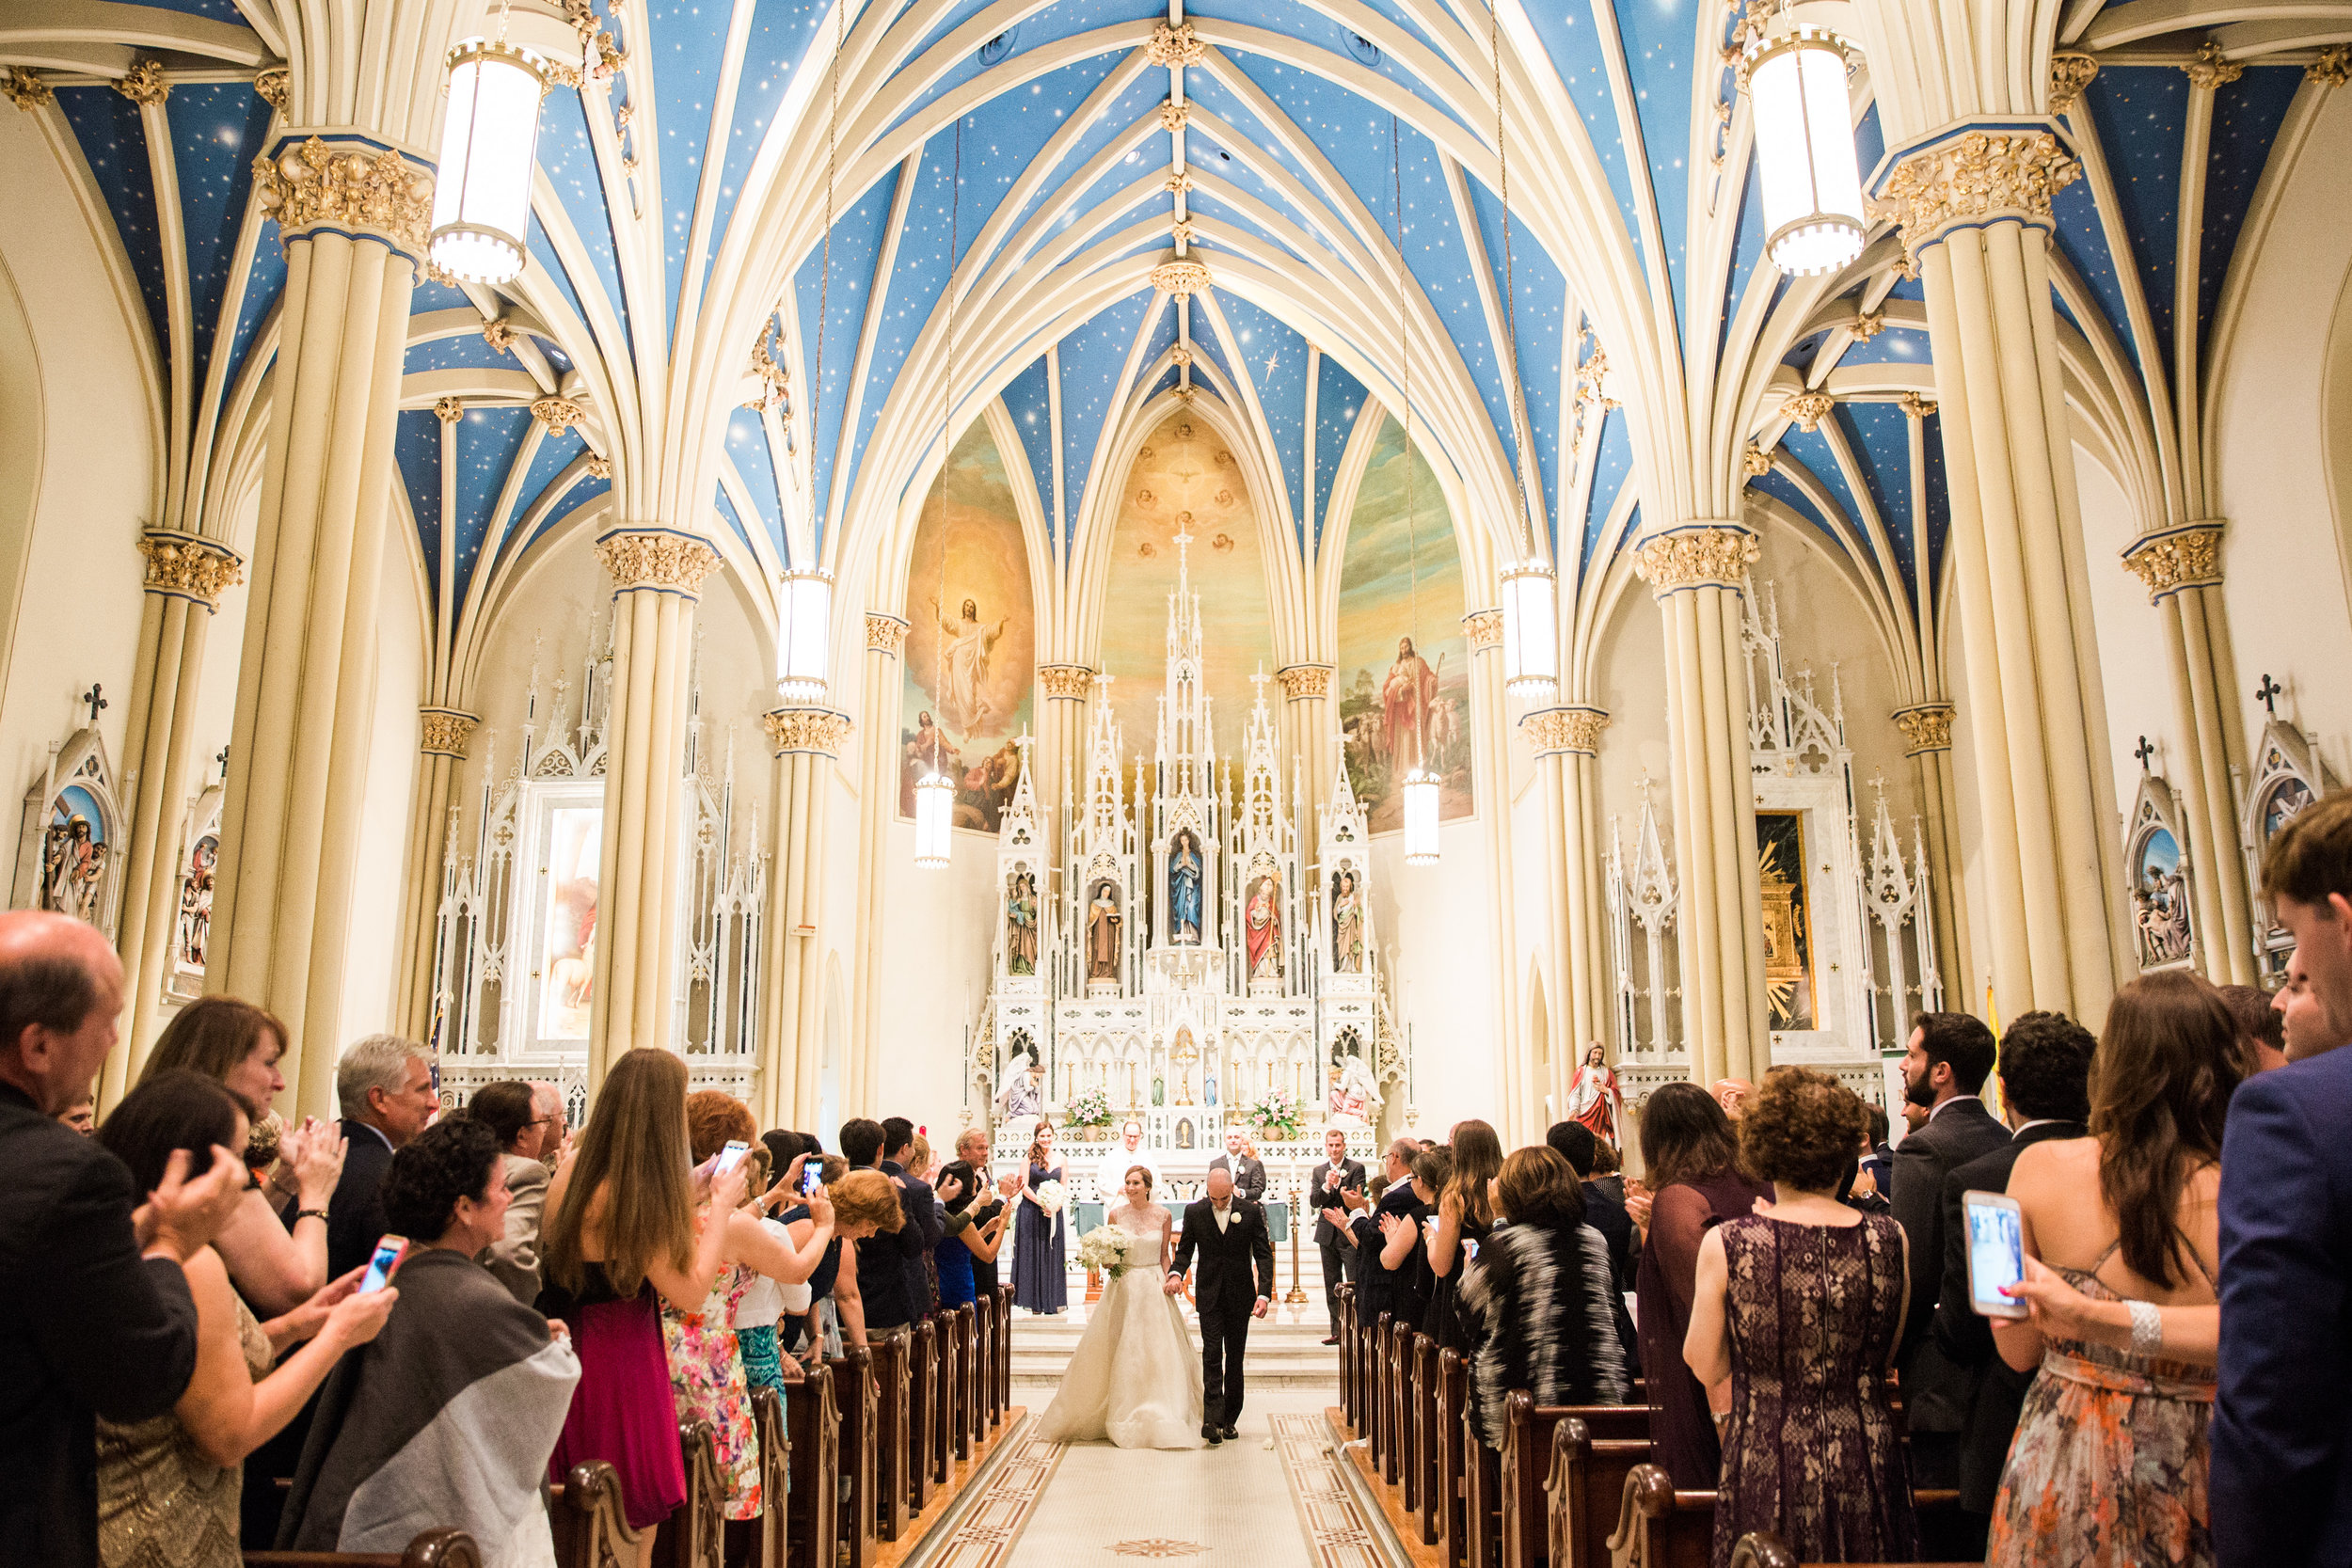 037-MA17_St-Marys-Catholic-Church-Annapolis-Wedding.jpg